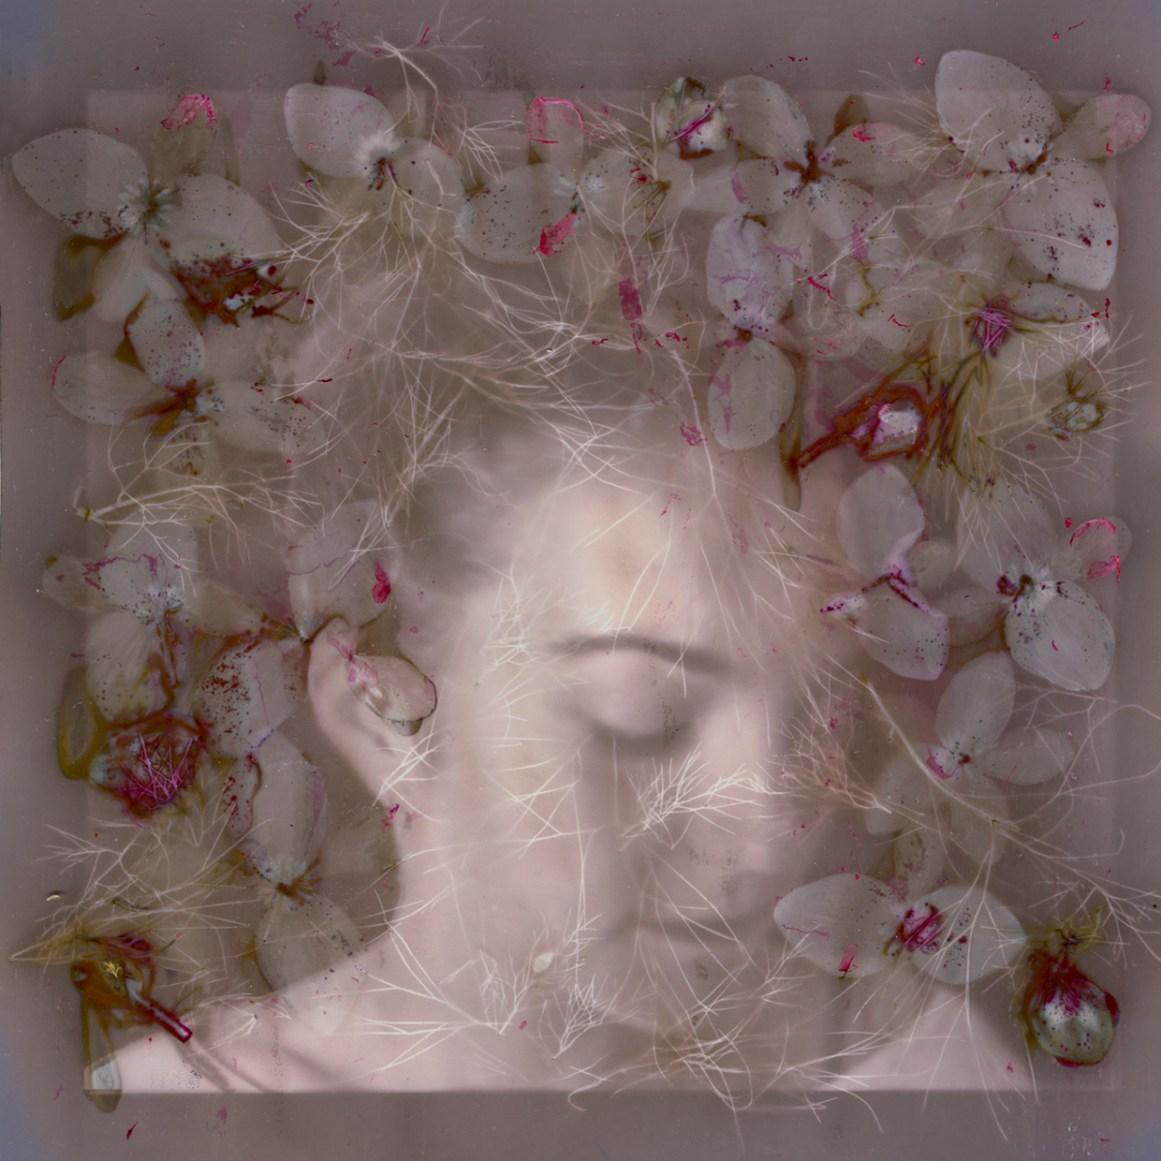 Blodewedd of the Nine Blossoms© Diane Fenster